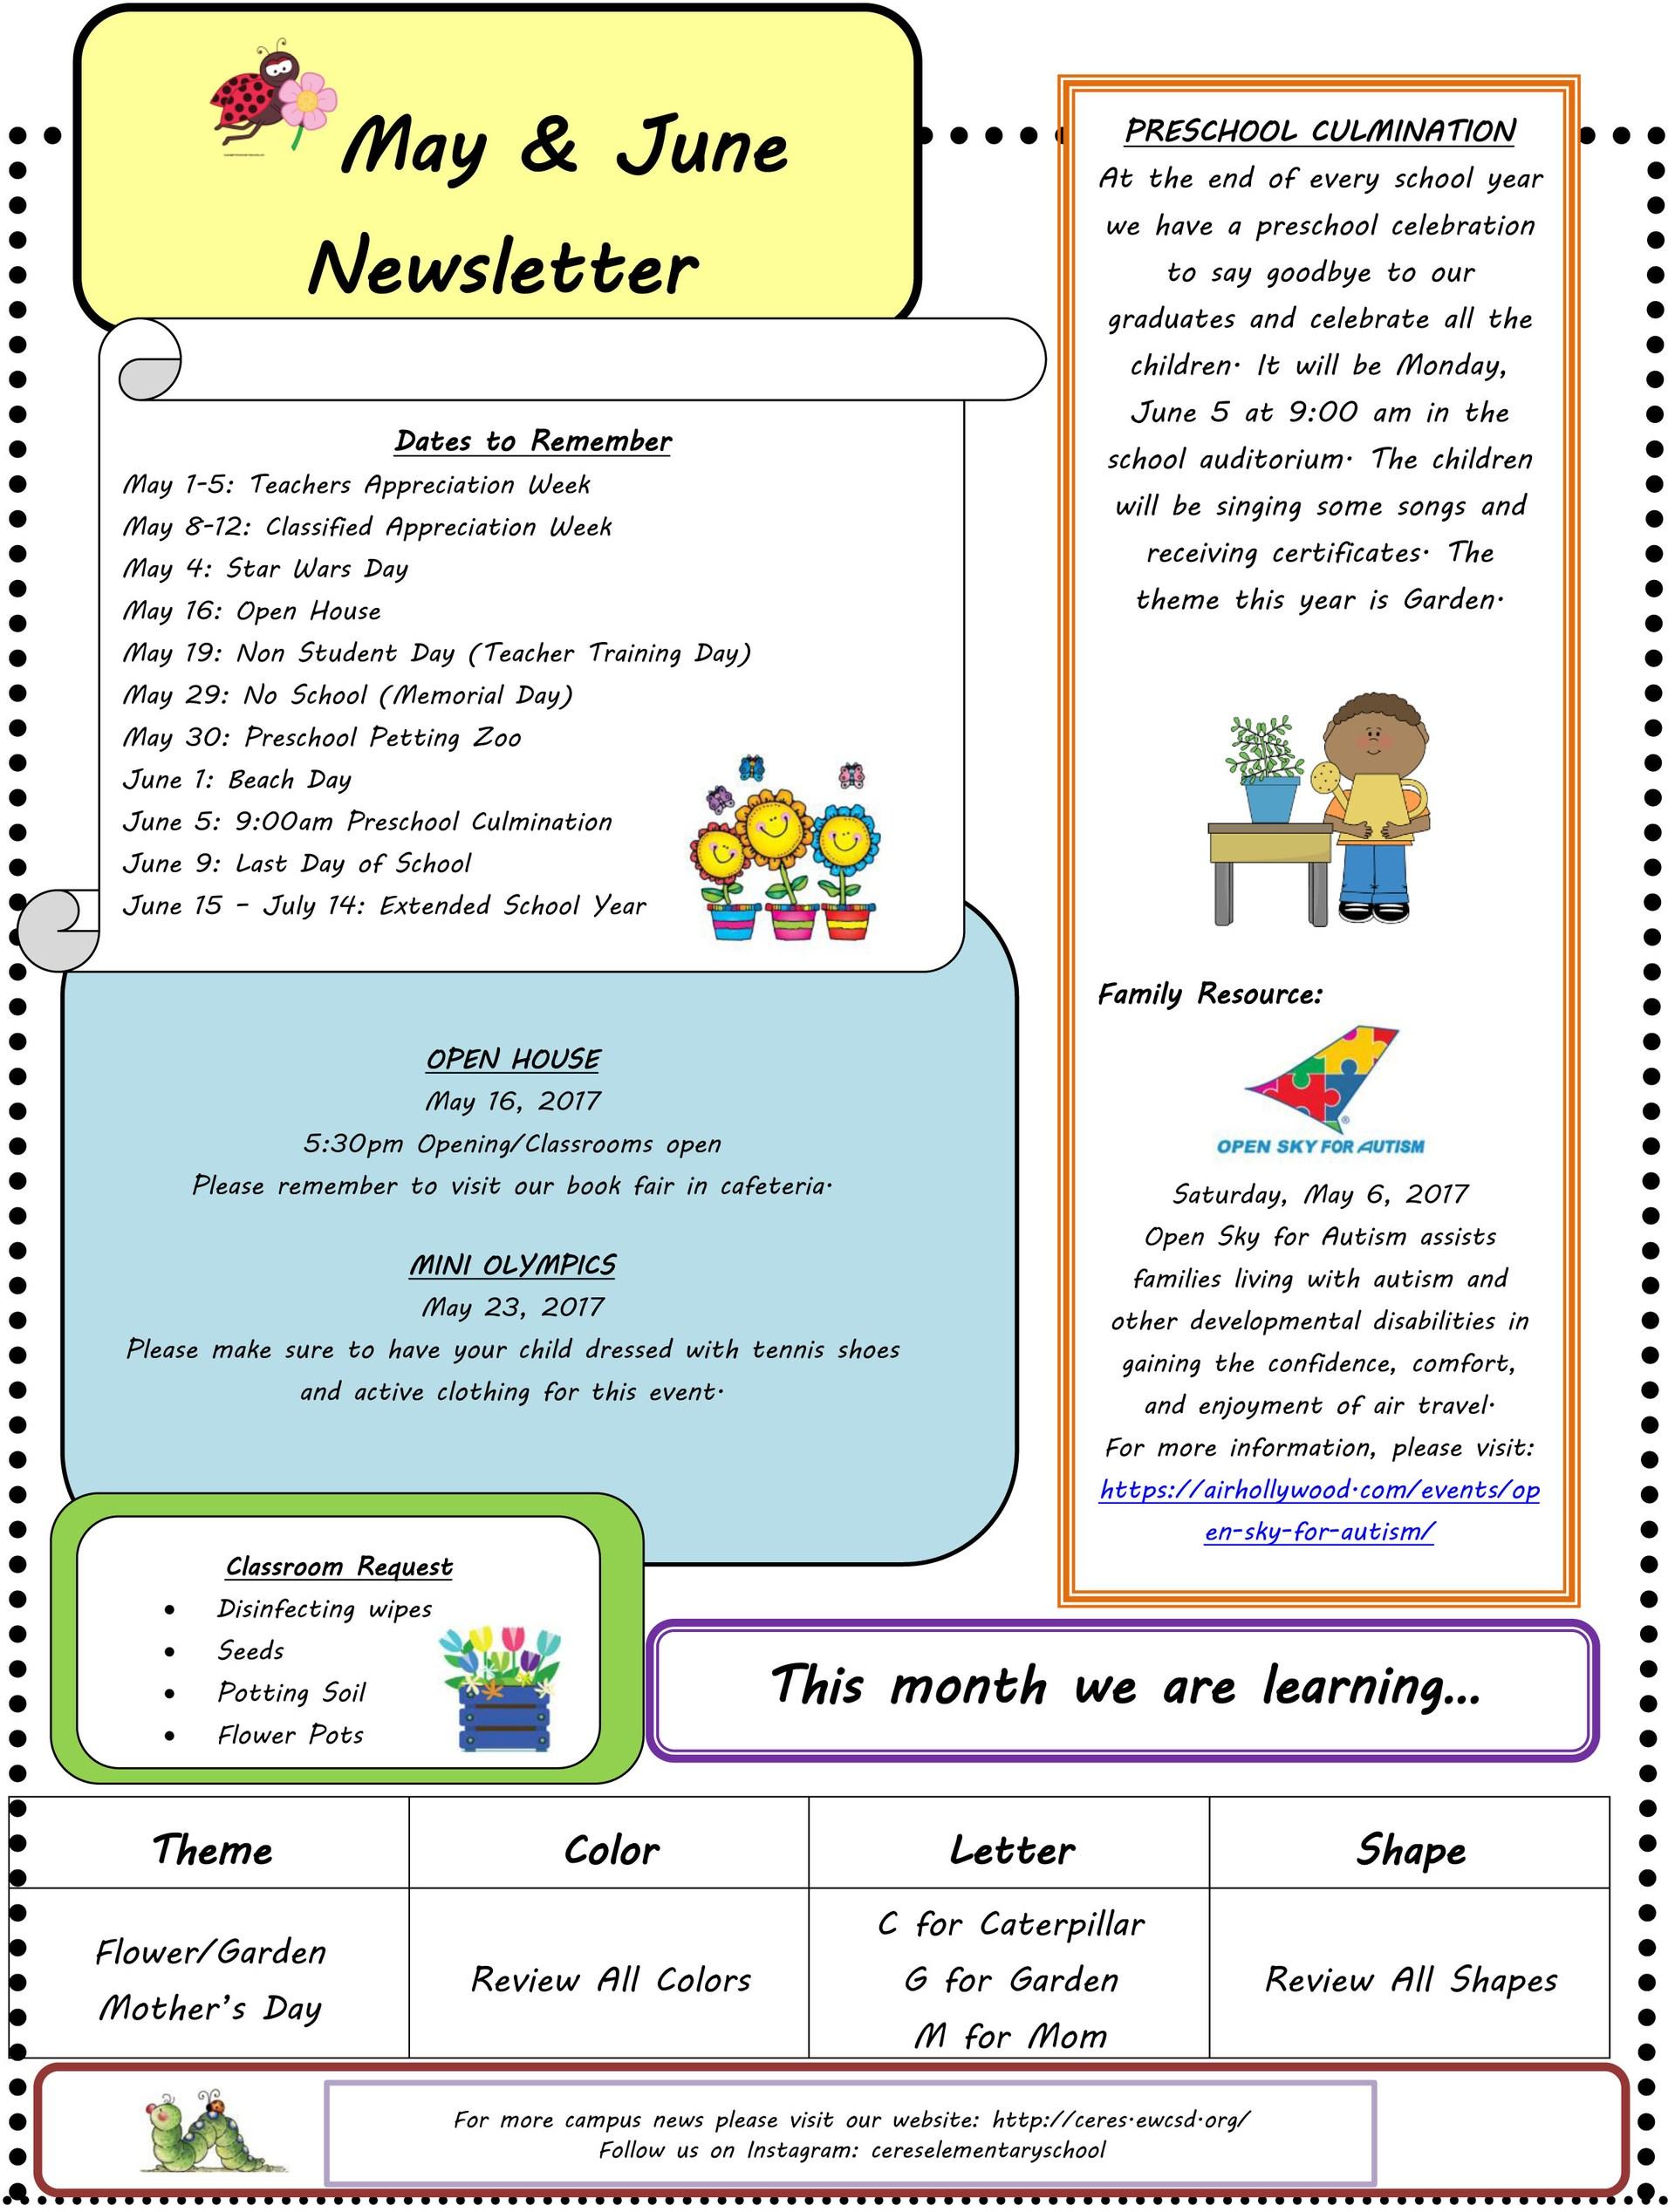 May-June newsletter for Ceres preschool